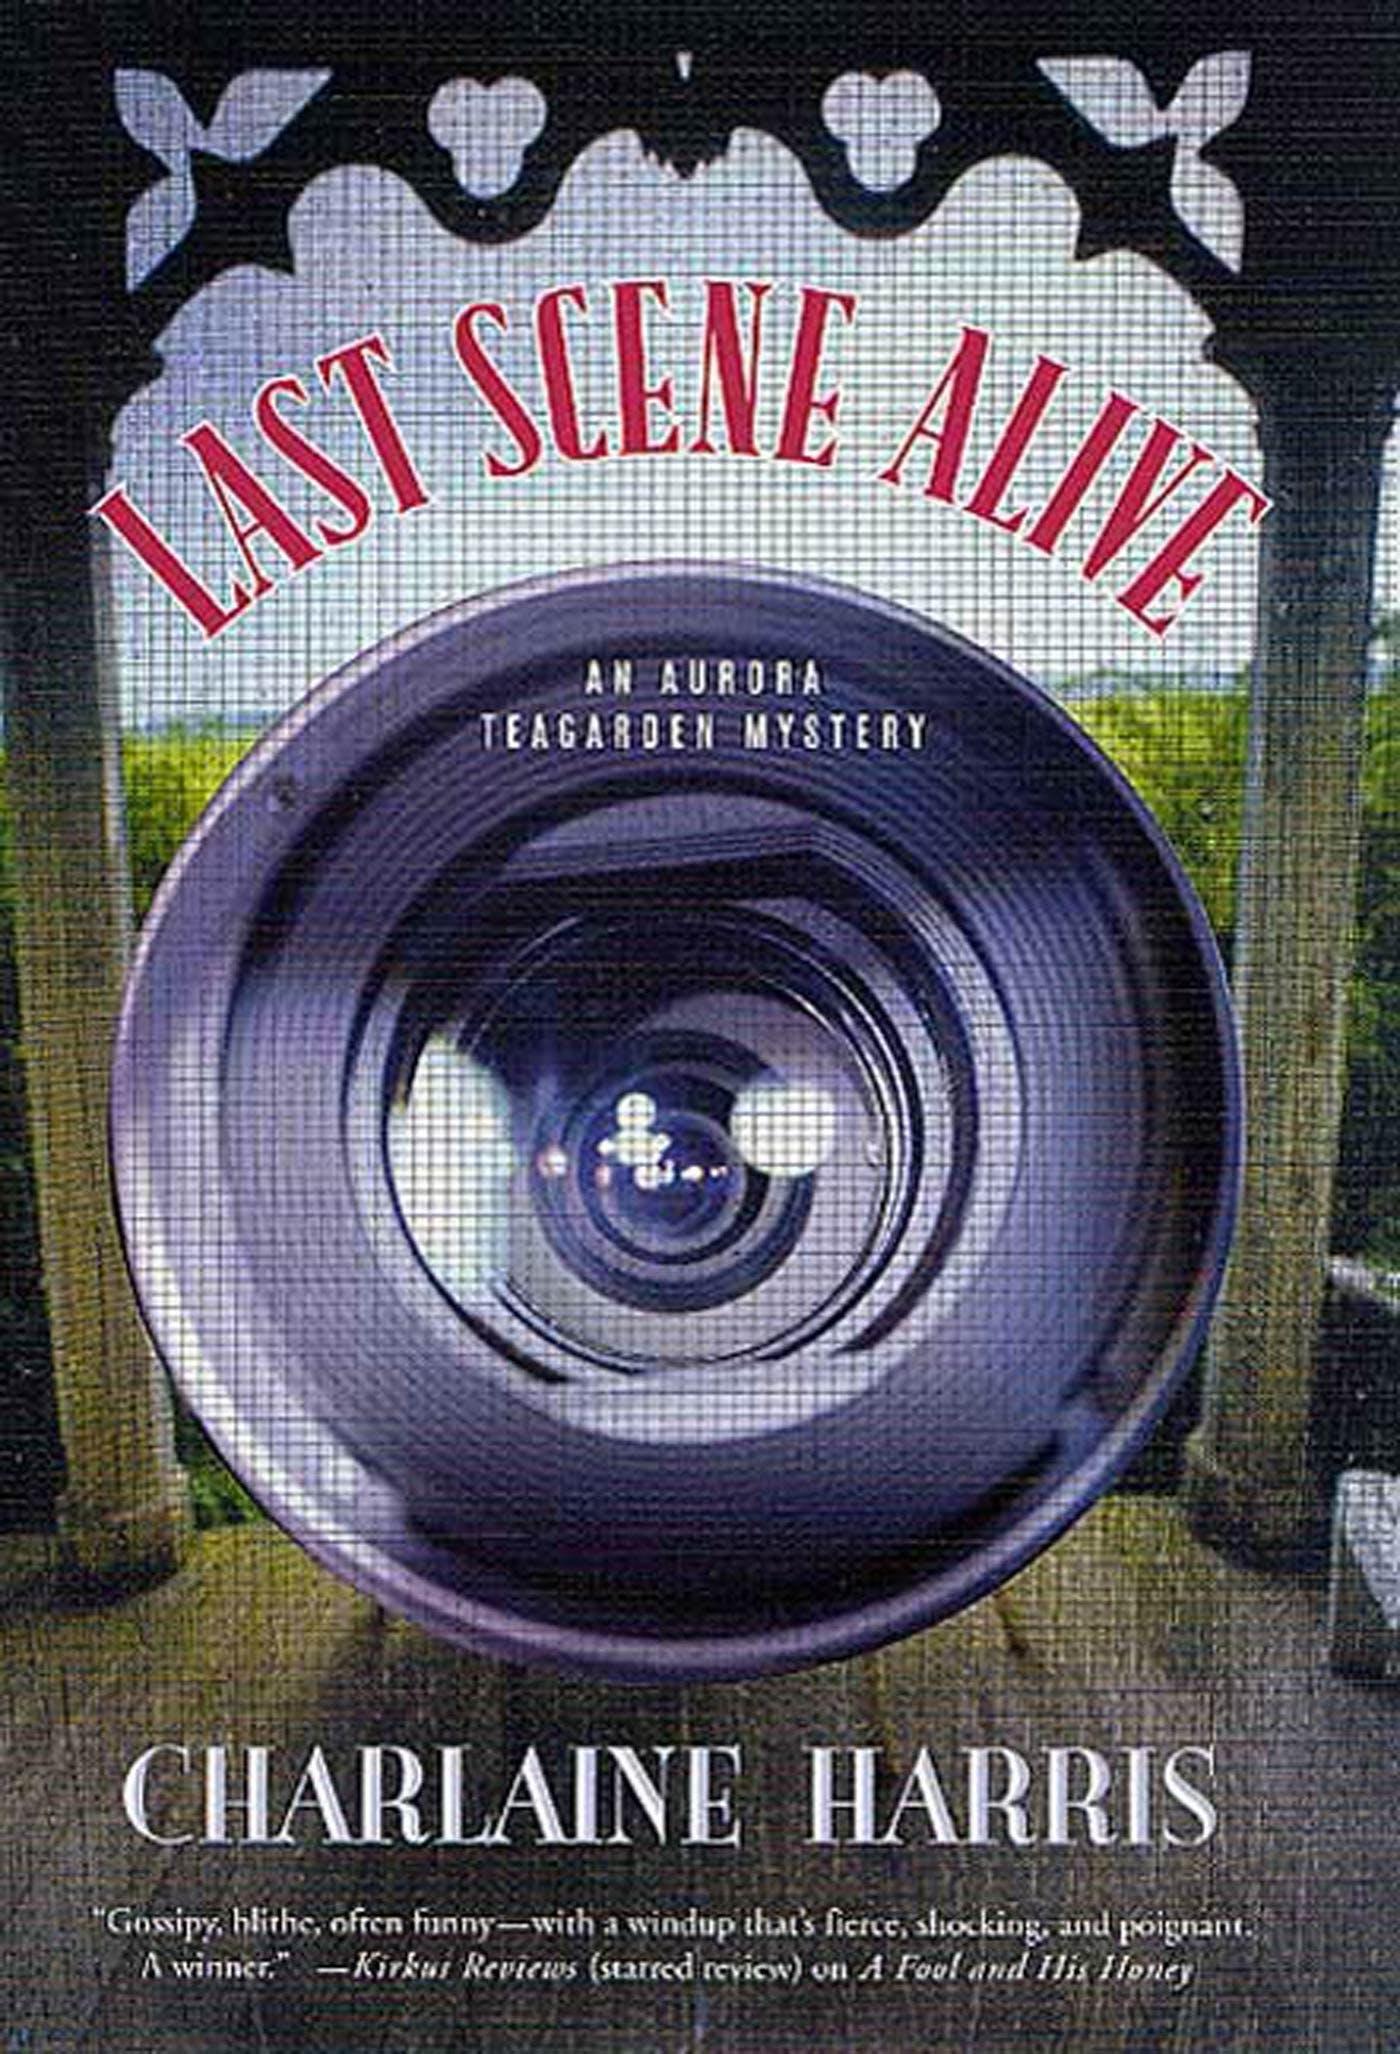 Image of Last Scene Alive